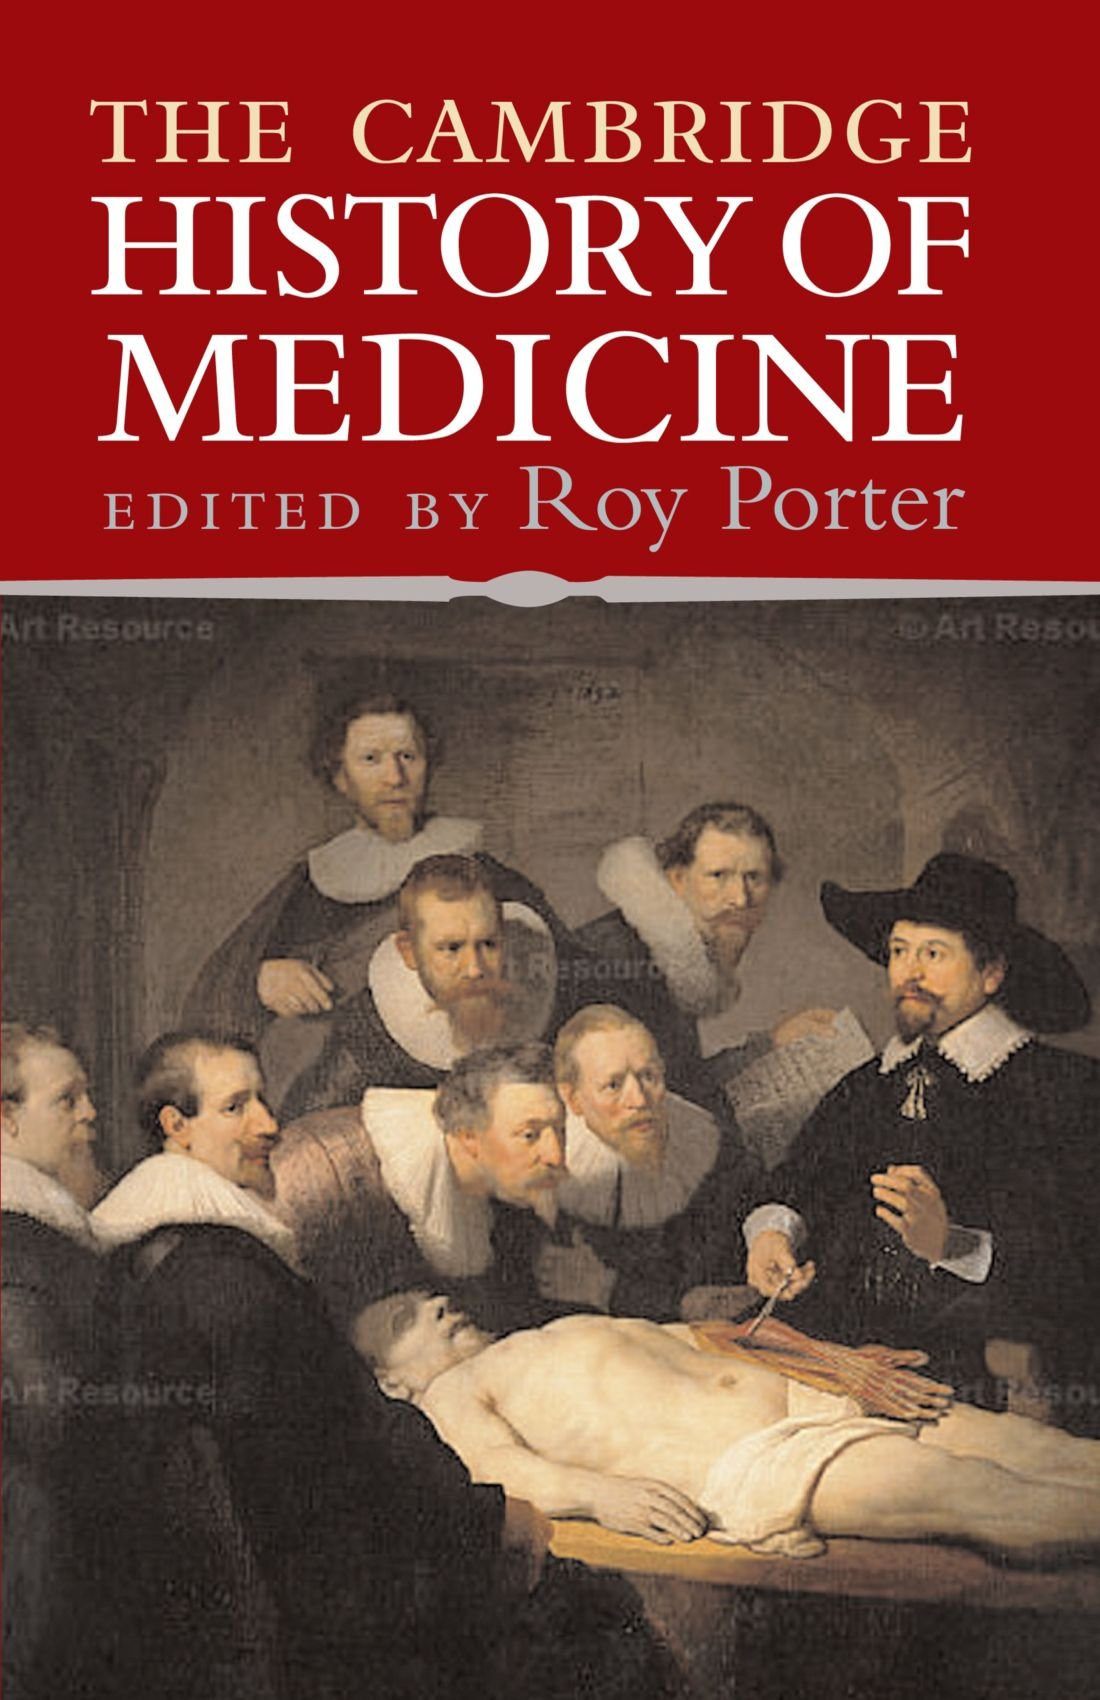 the cambridge history of medicine amazon co uk roy porter  the cambridge history of medicine amazon co uk roy porter 9780521682893 books